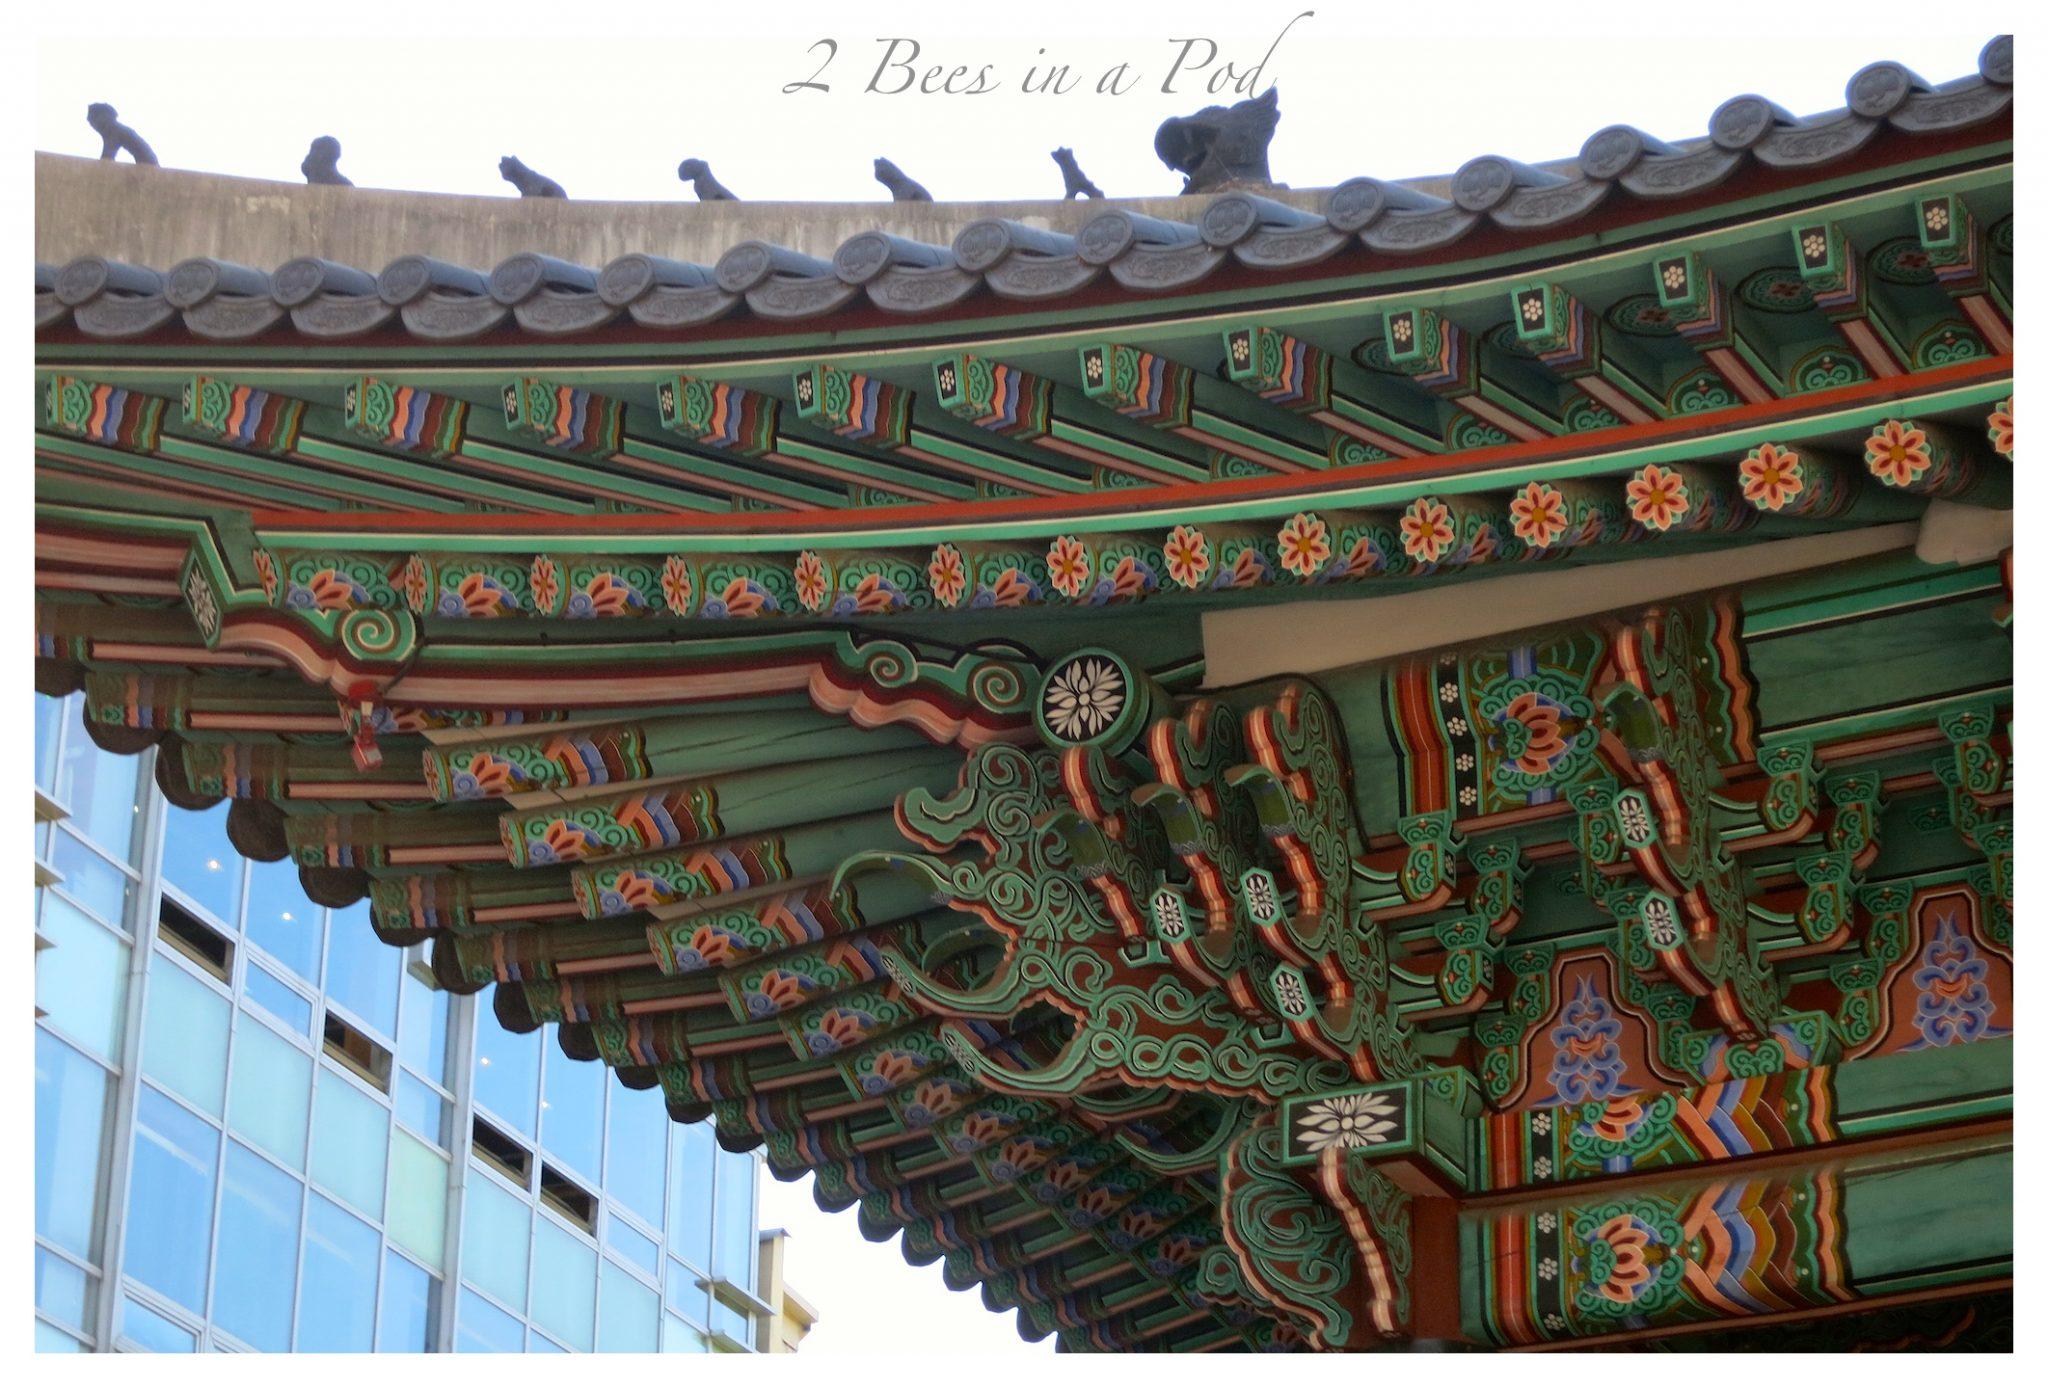 Beautiful architecture at the Seoul, South Korea Palace